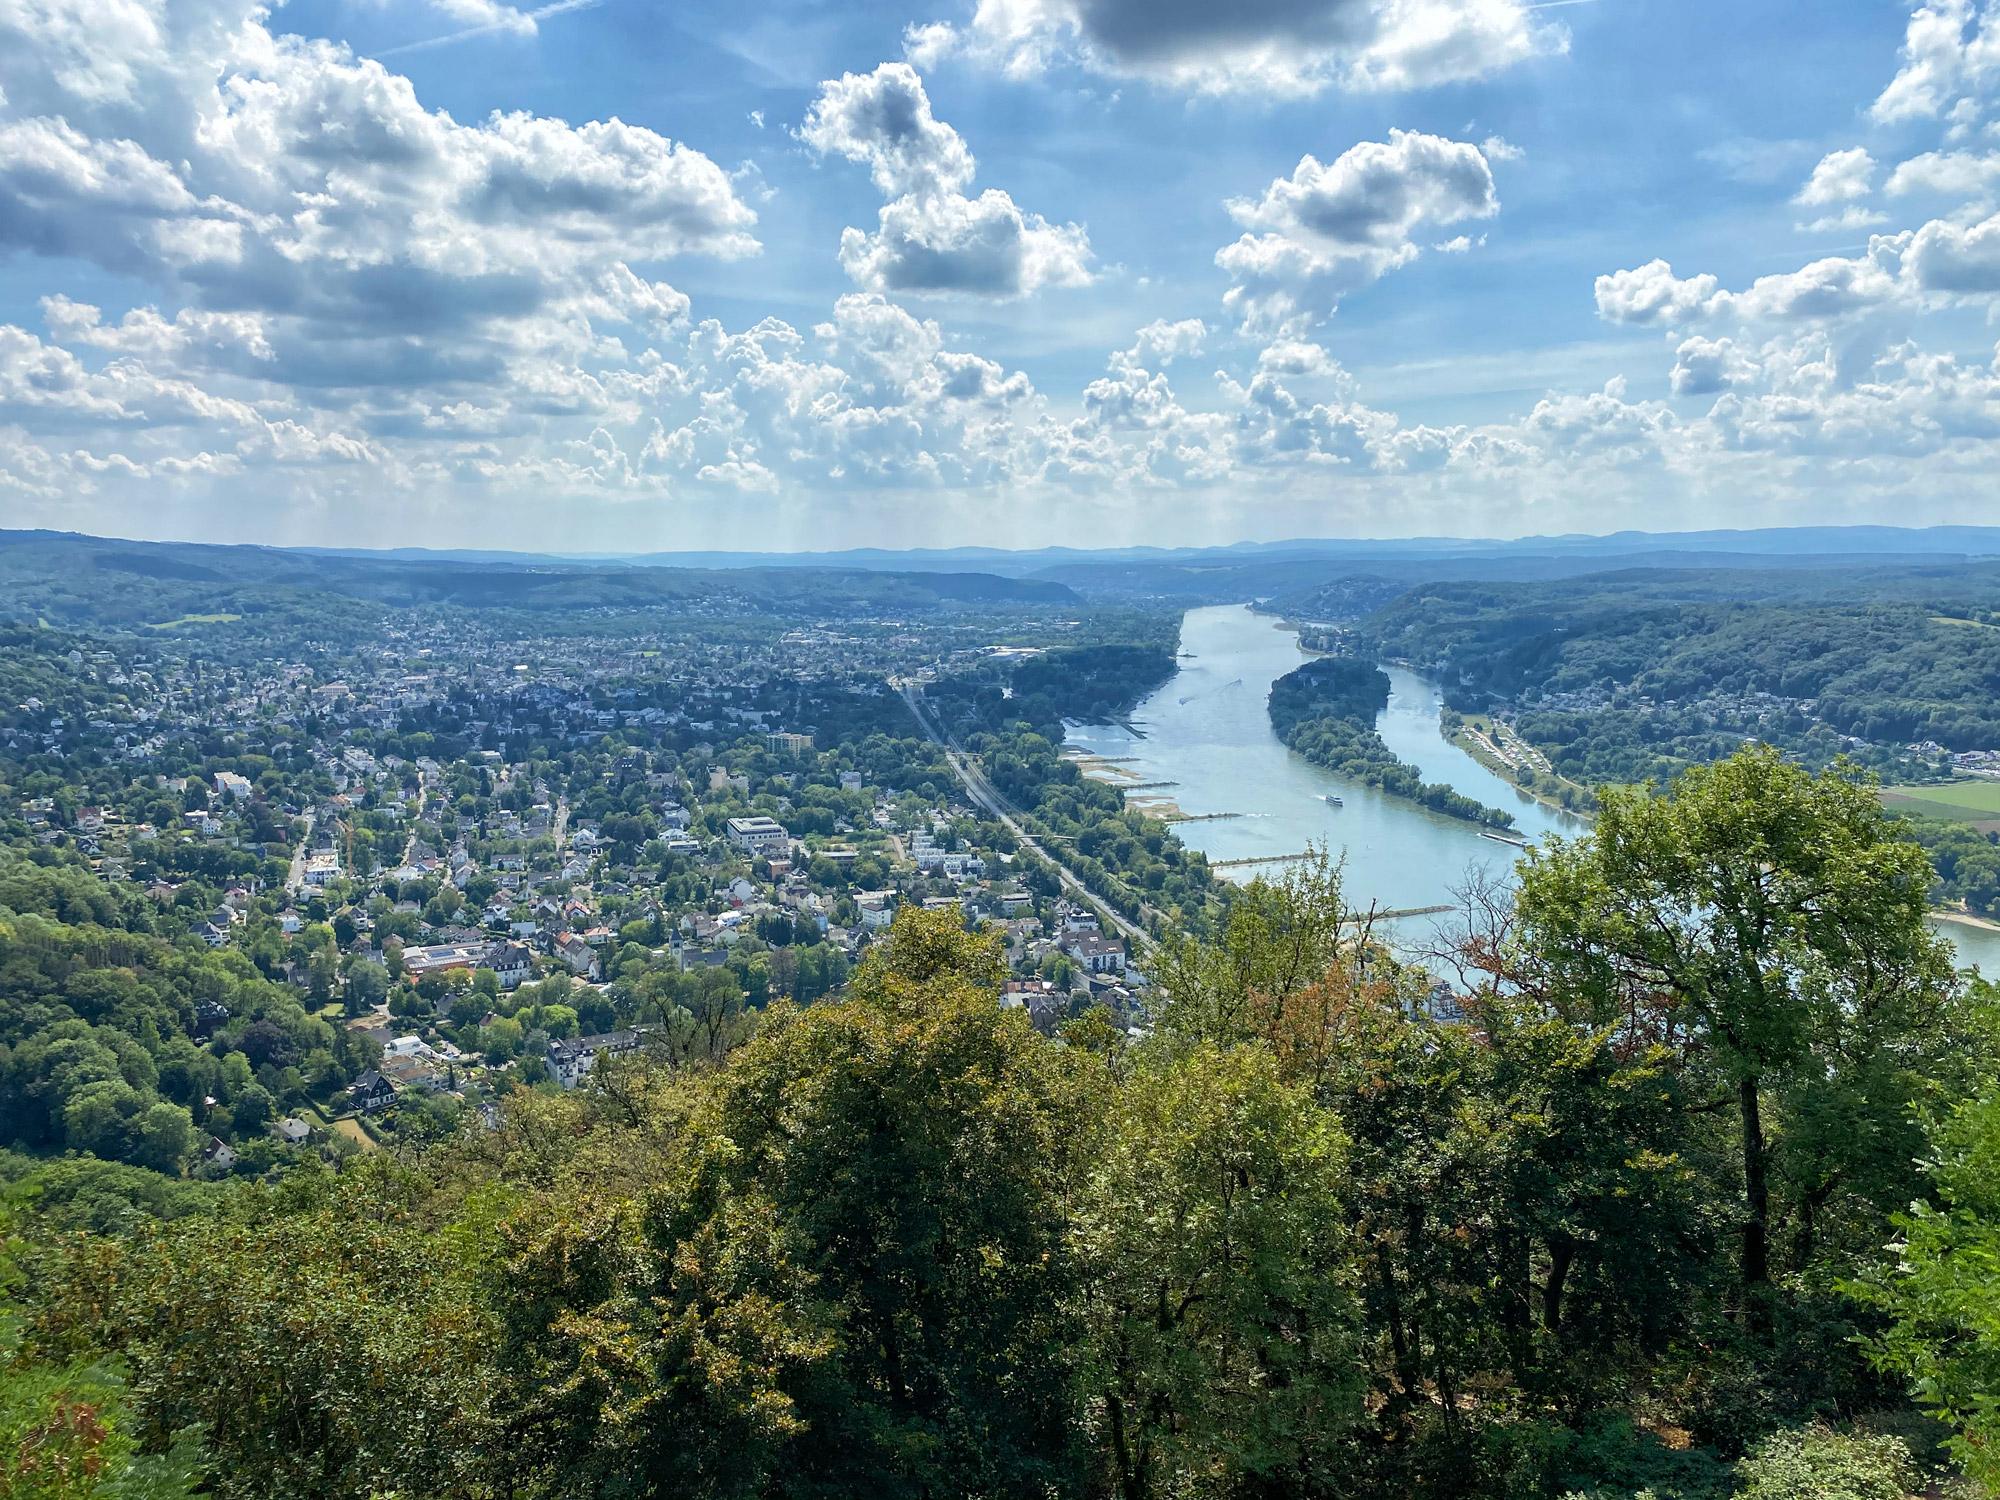 Uitzicht vanaf de Drachenfels